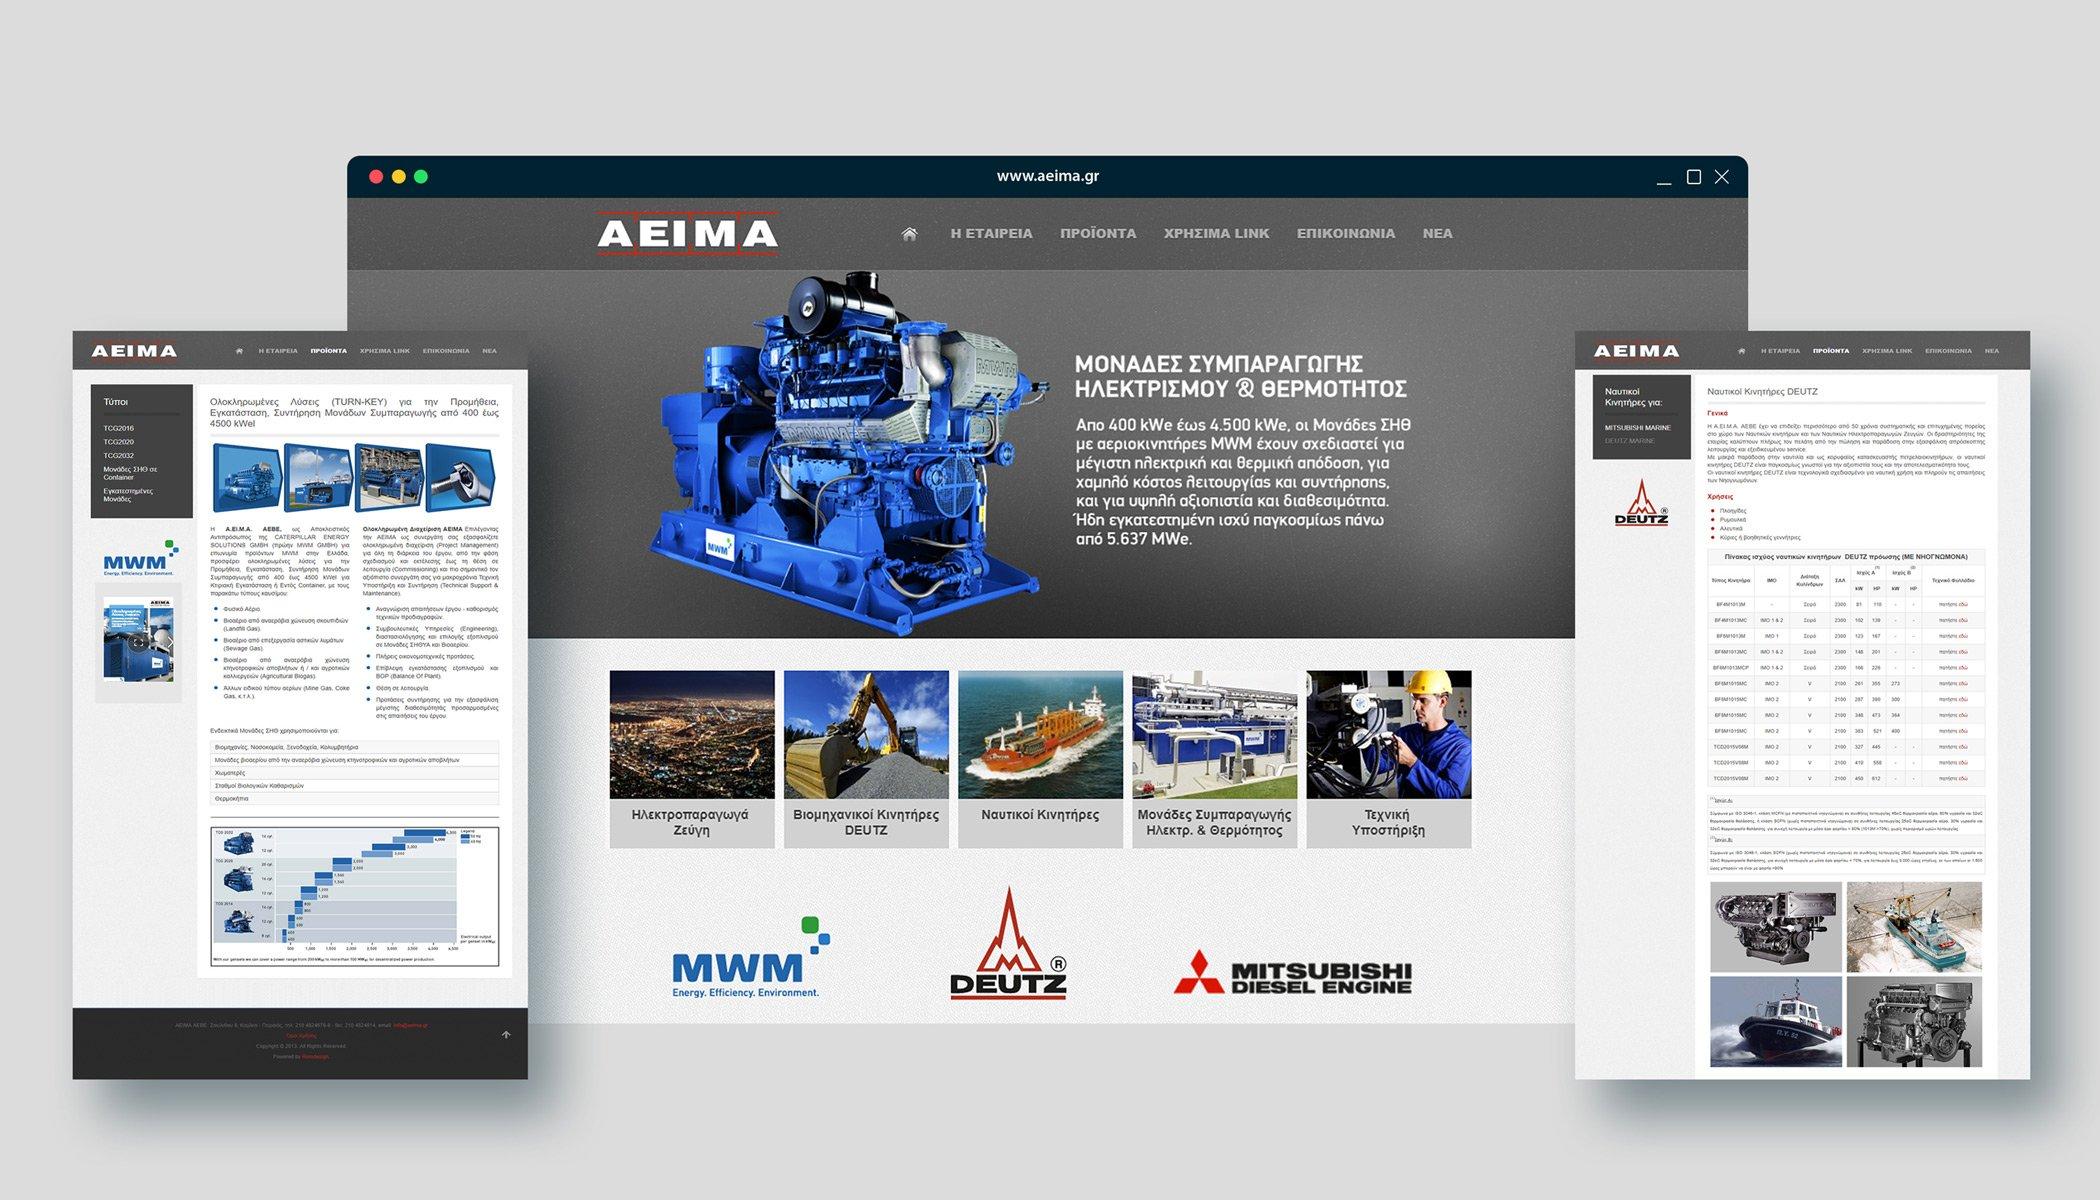 AEIMA SA Web Site